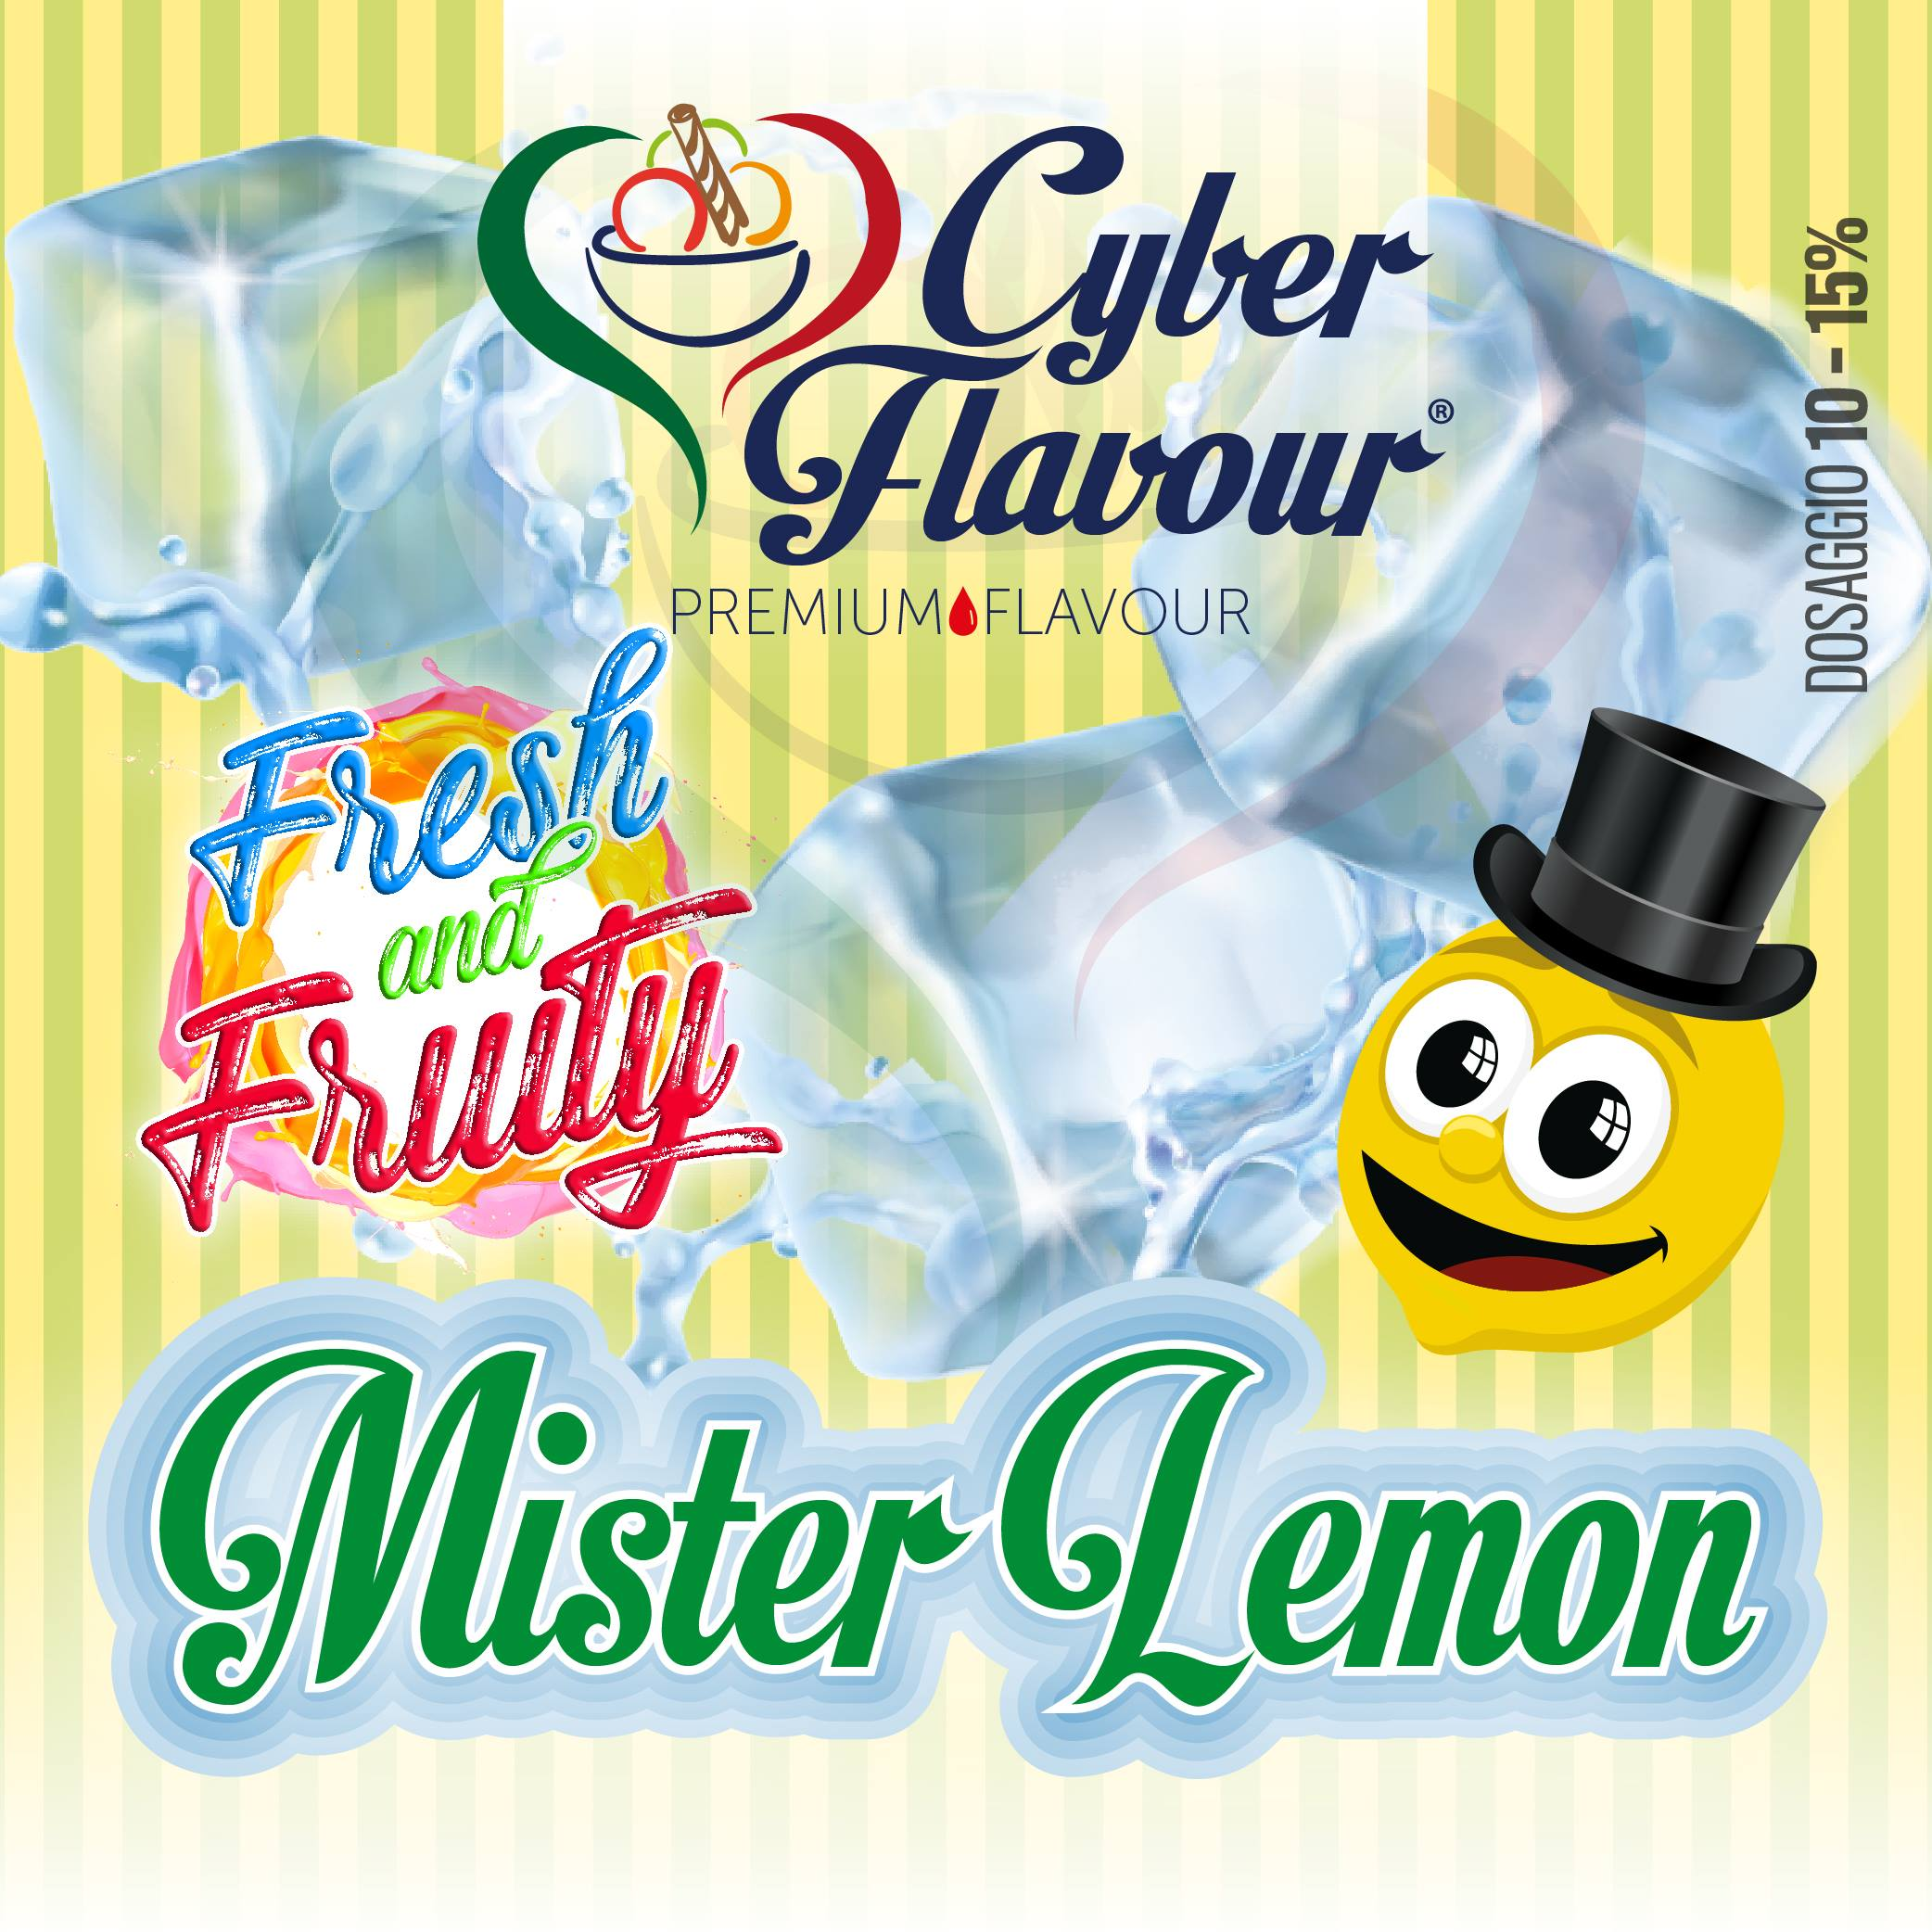 Cyber Flavour Mr Lemon Aroma